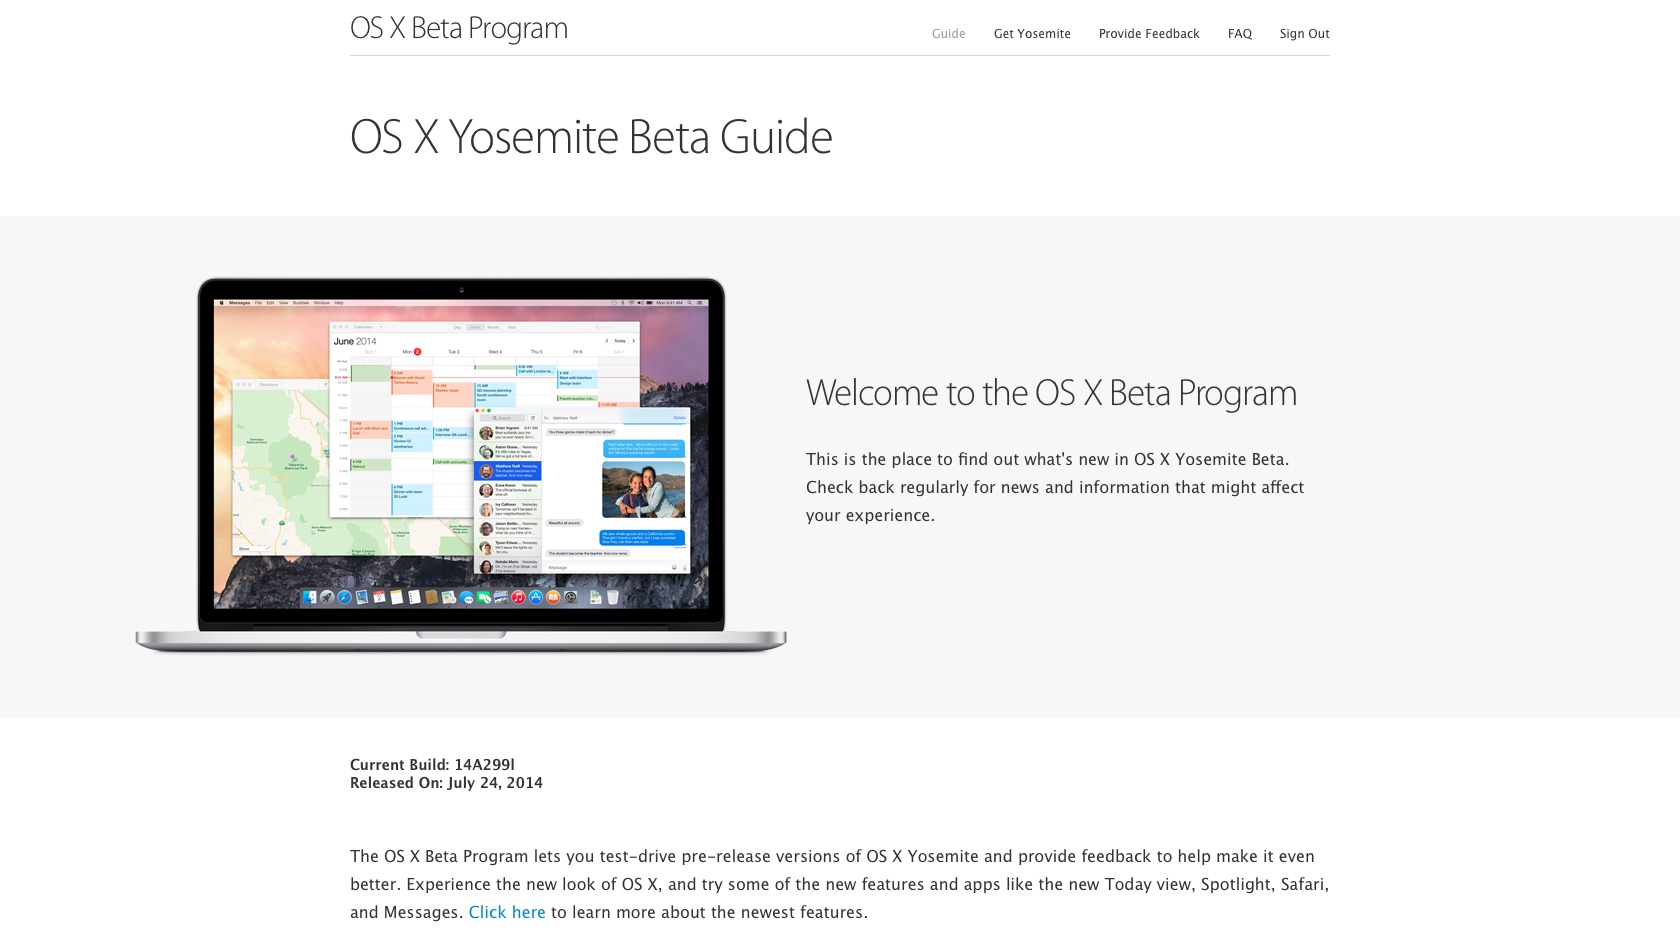 OS X Yosemite Beta Program Now Live